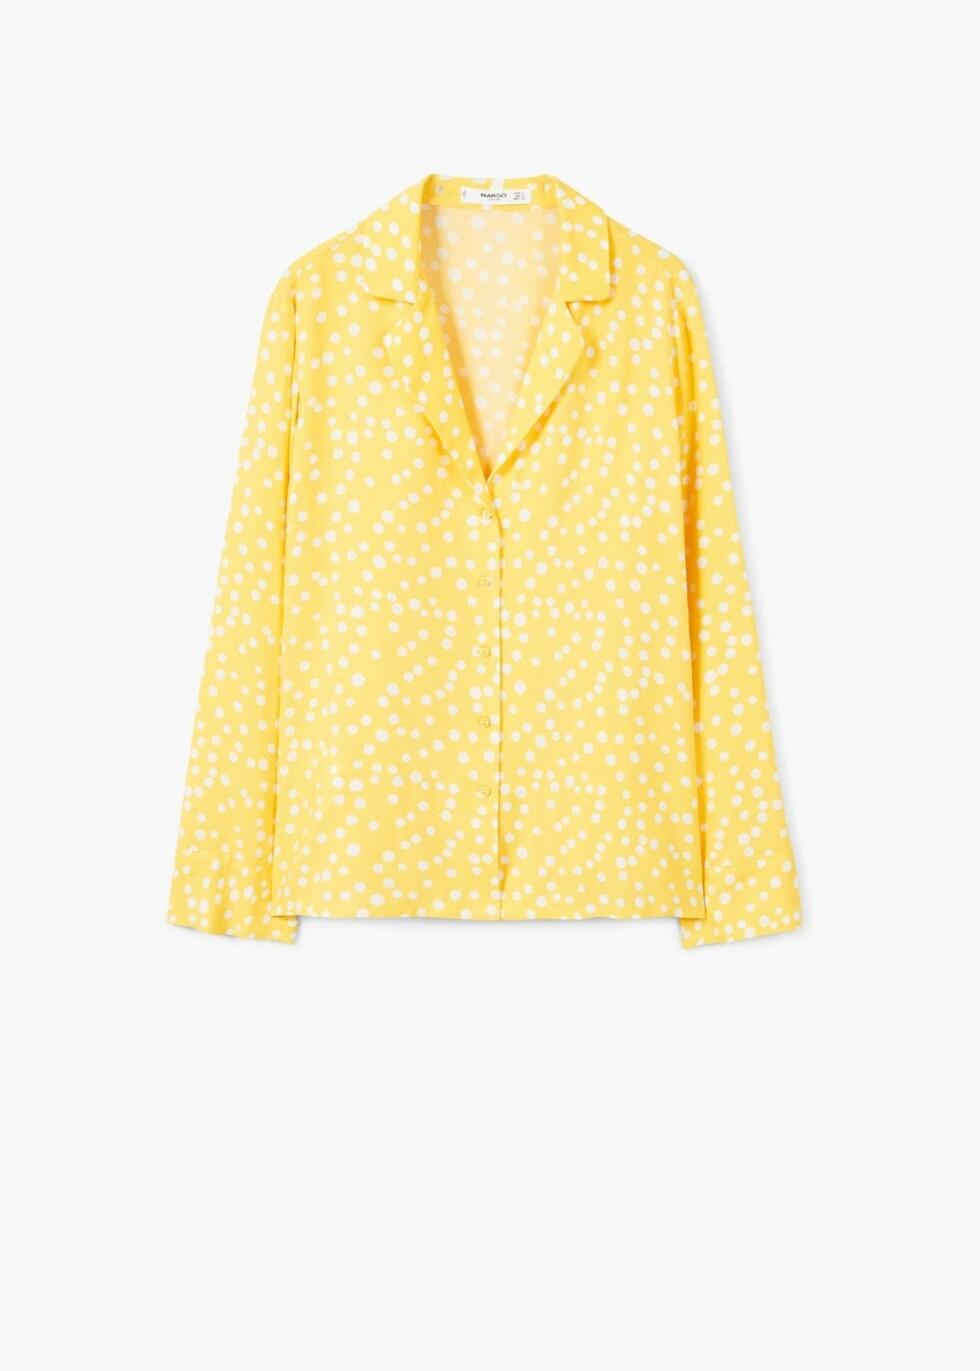 Skjorte fra Mango  249,-  https://shop.mango.com/no/damer/skjorter-skjorter/l%C3%B8s-skjorte-med-knapper_23090374.html?c=12&n=1&s=search